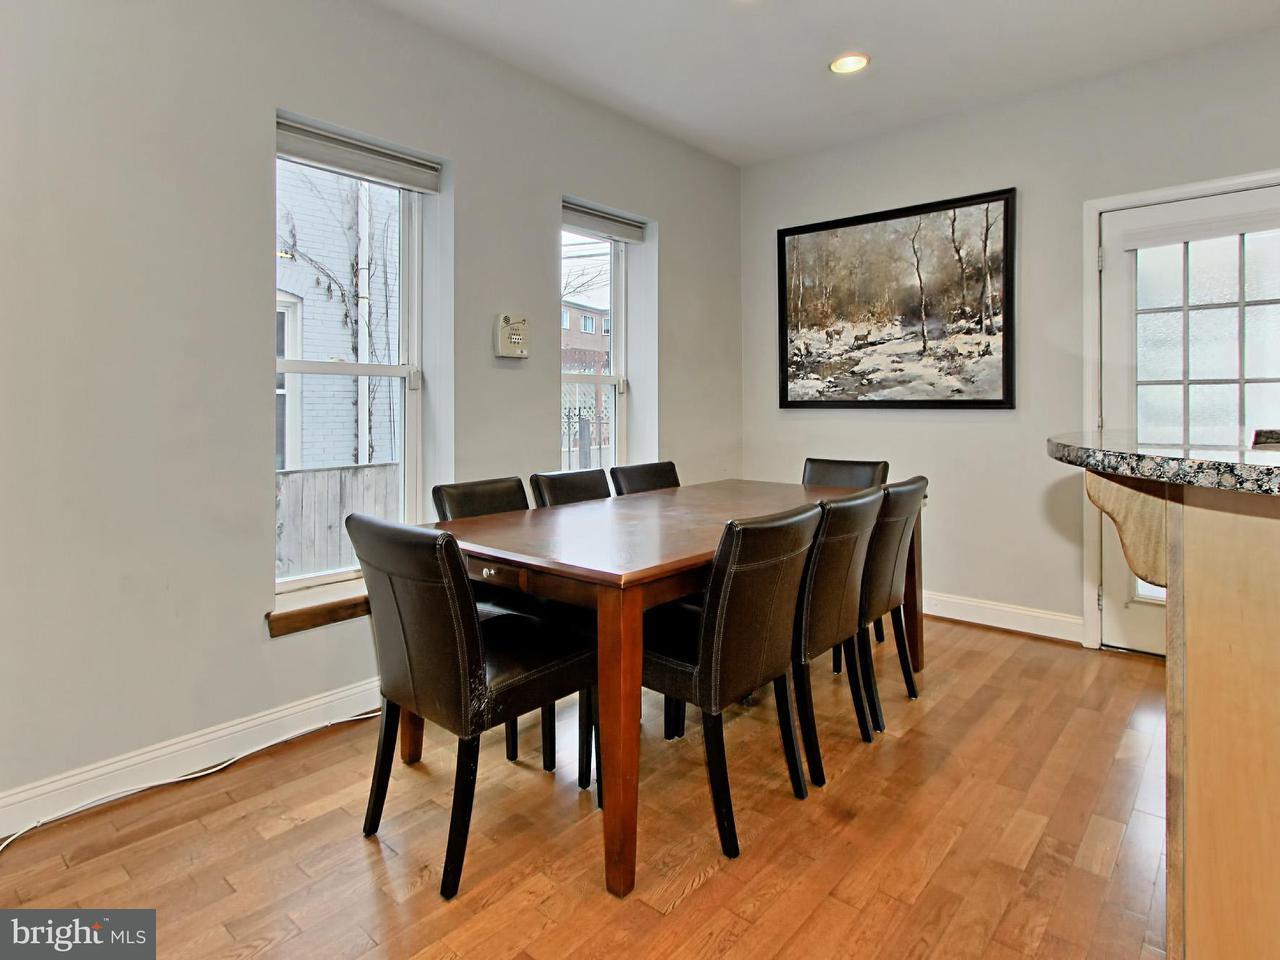 Additional photo for property listing at 3518 10th St Nw #A 3518 10th St Nw #A Washington, Distrito De Columbia 20010 Estados Unidos